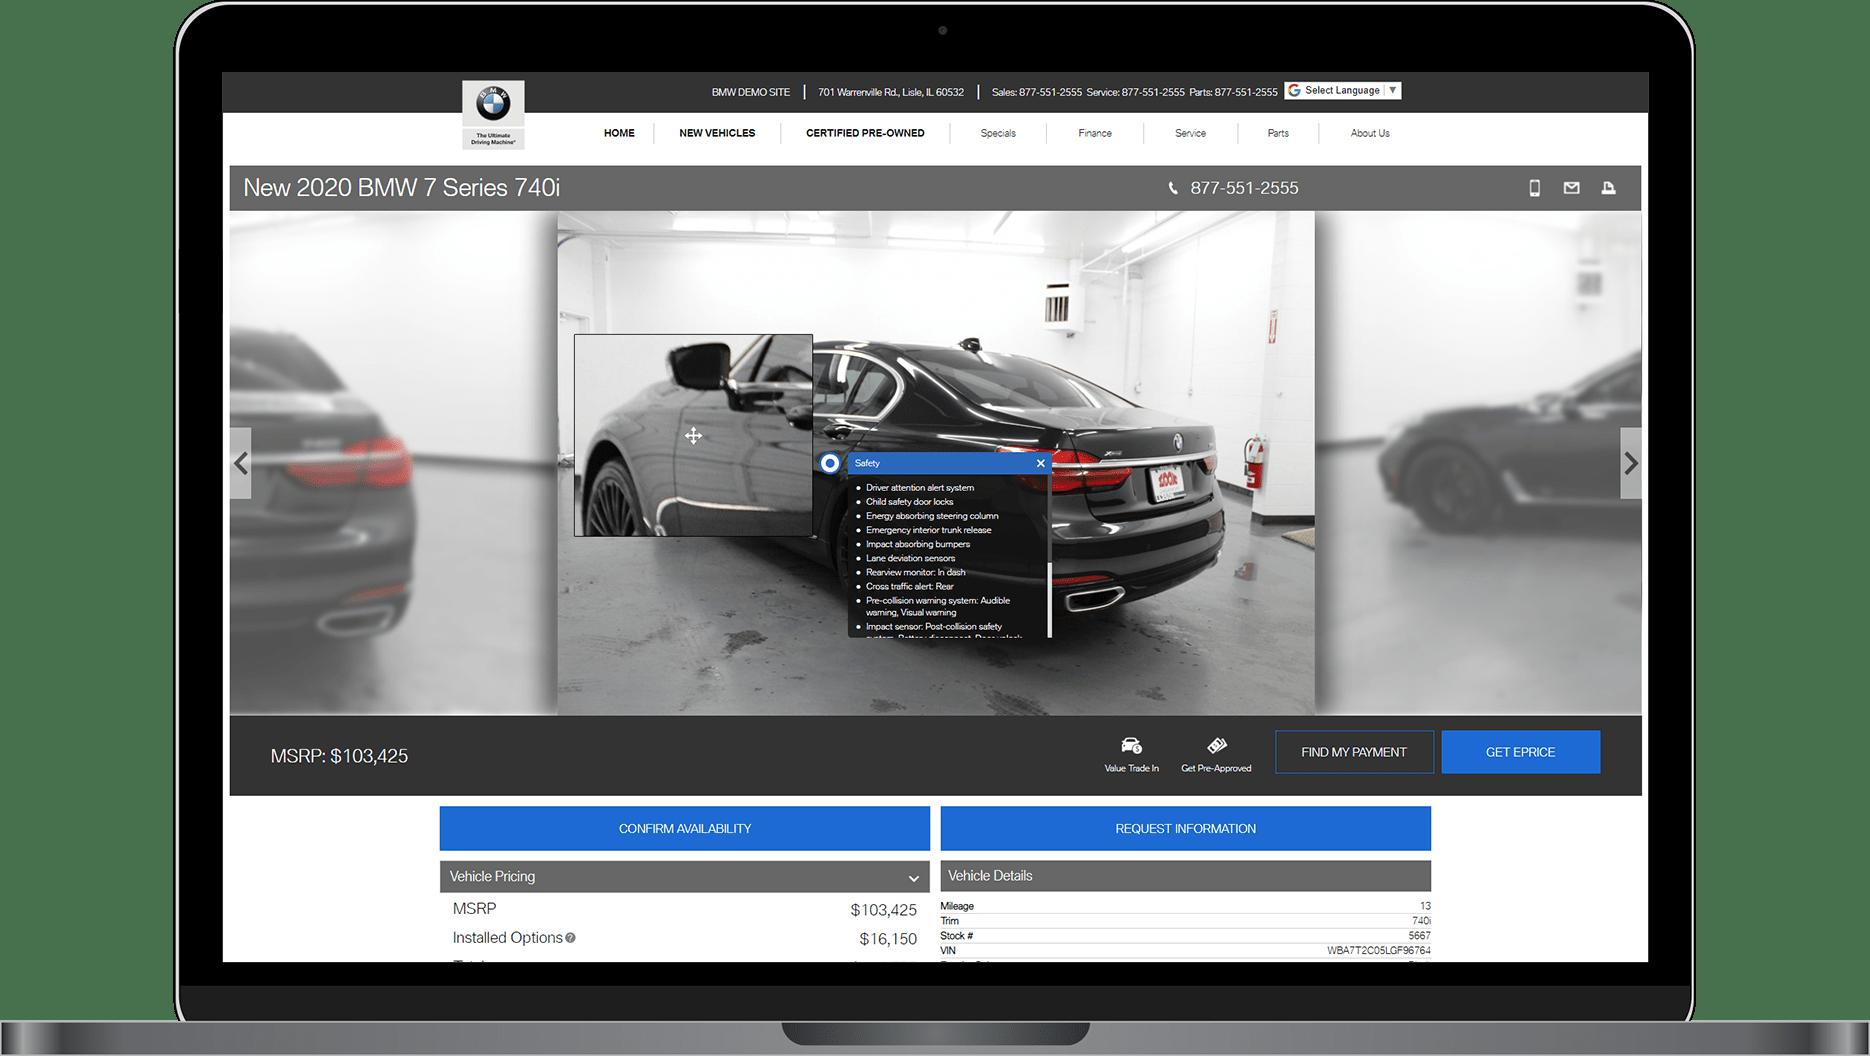 VDPxL on BMW website